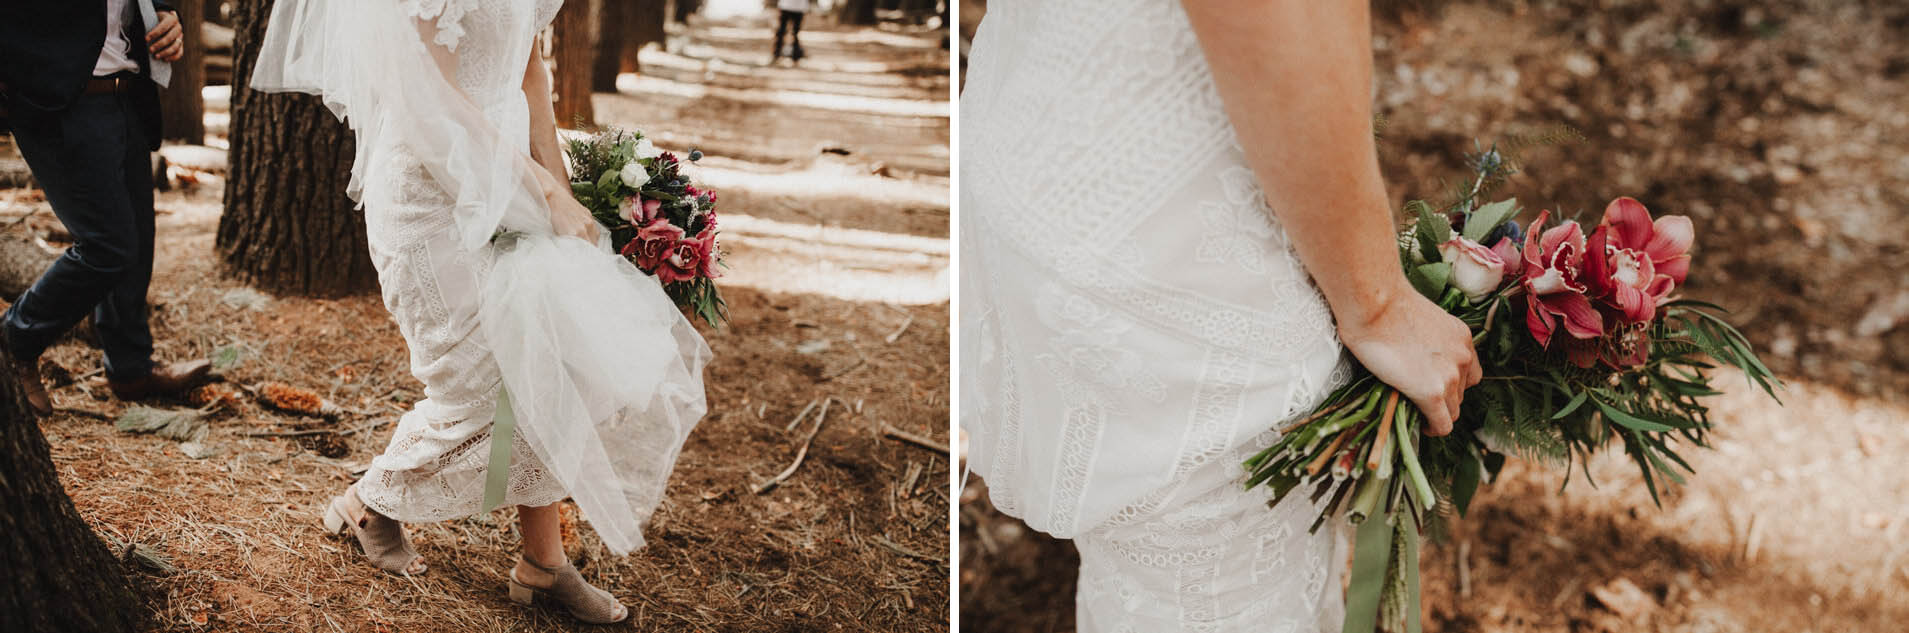 suger-pine-walk-wedding (Corinna & Dylan)_159(3018)2.jpg